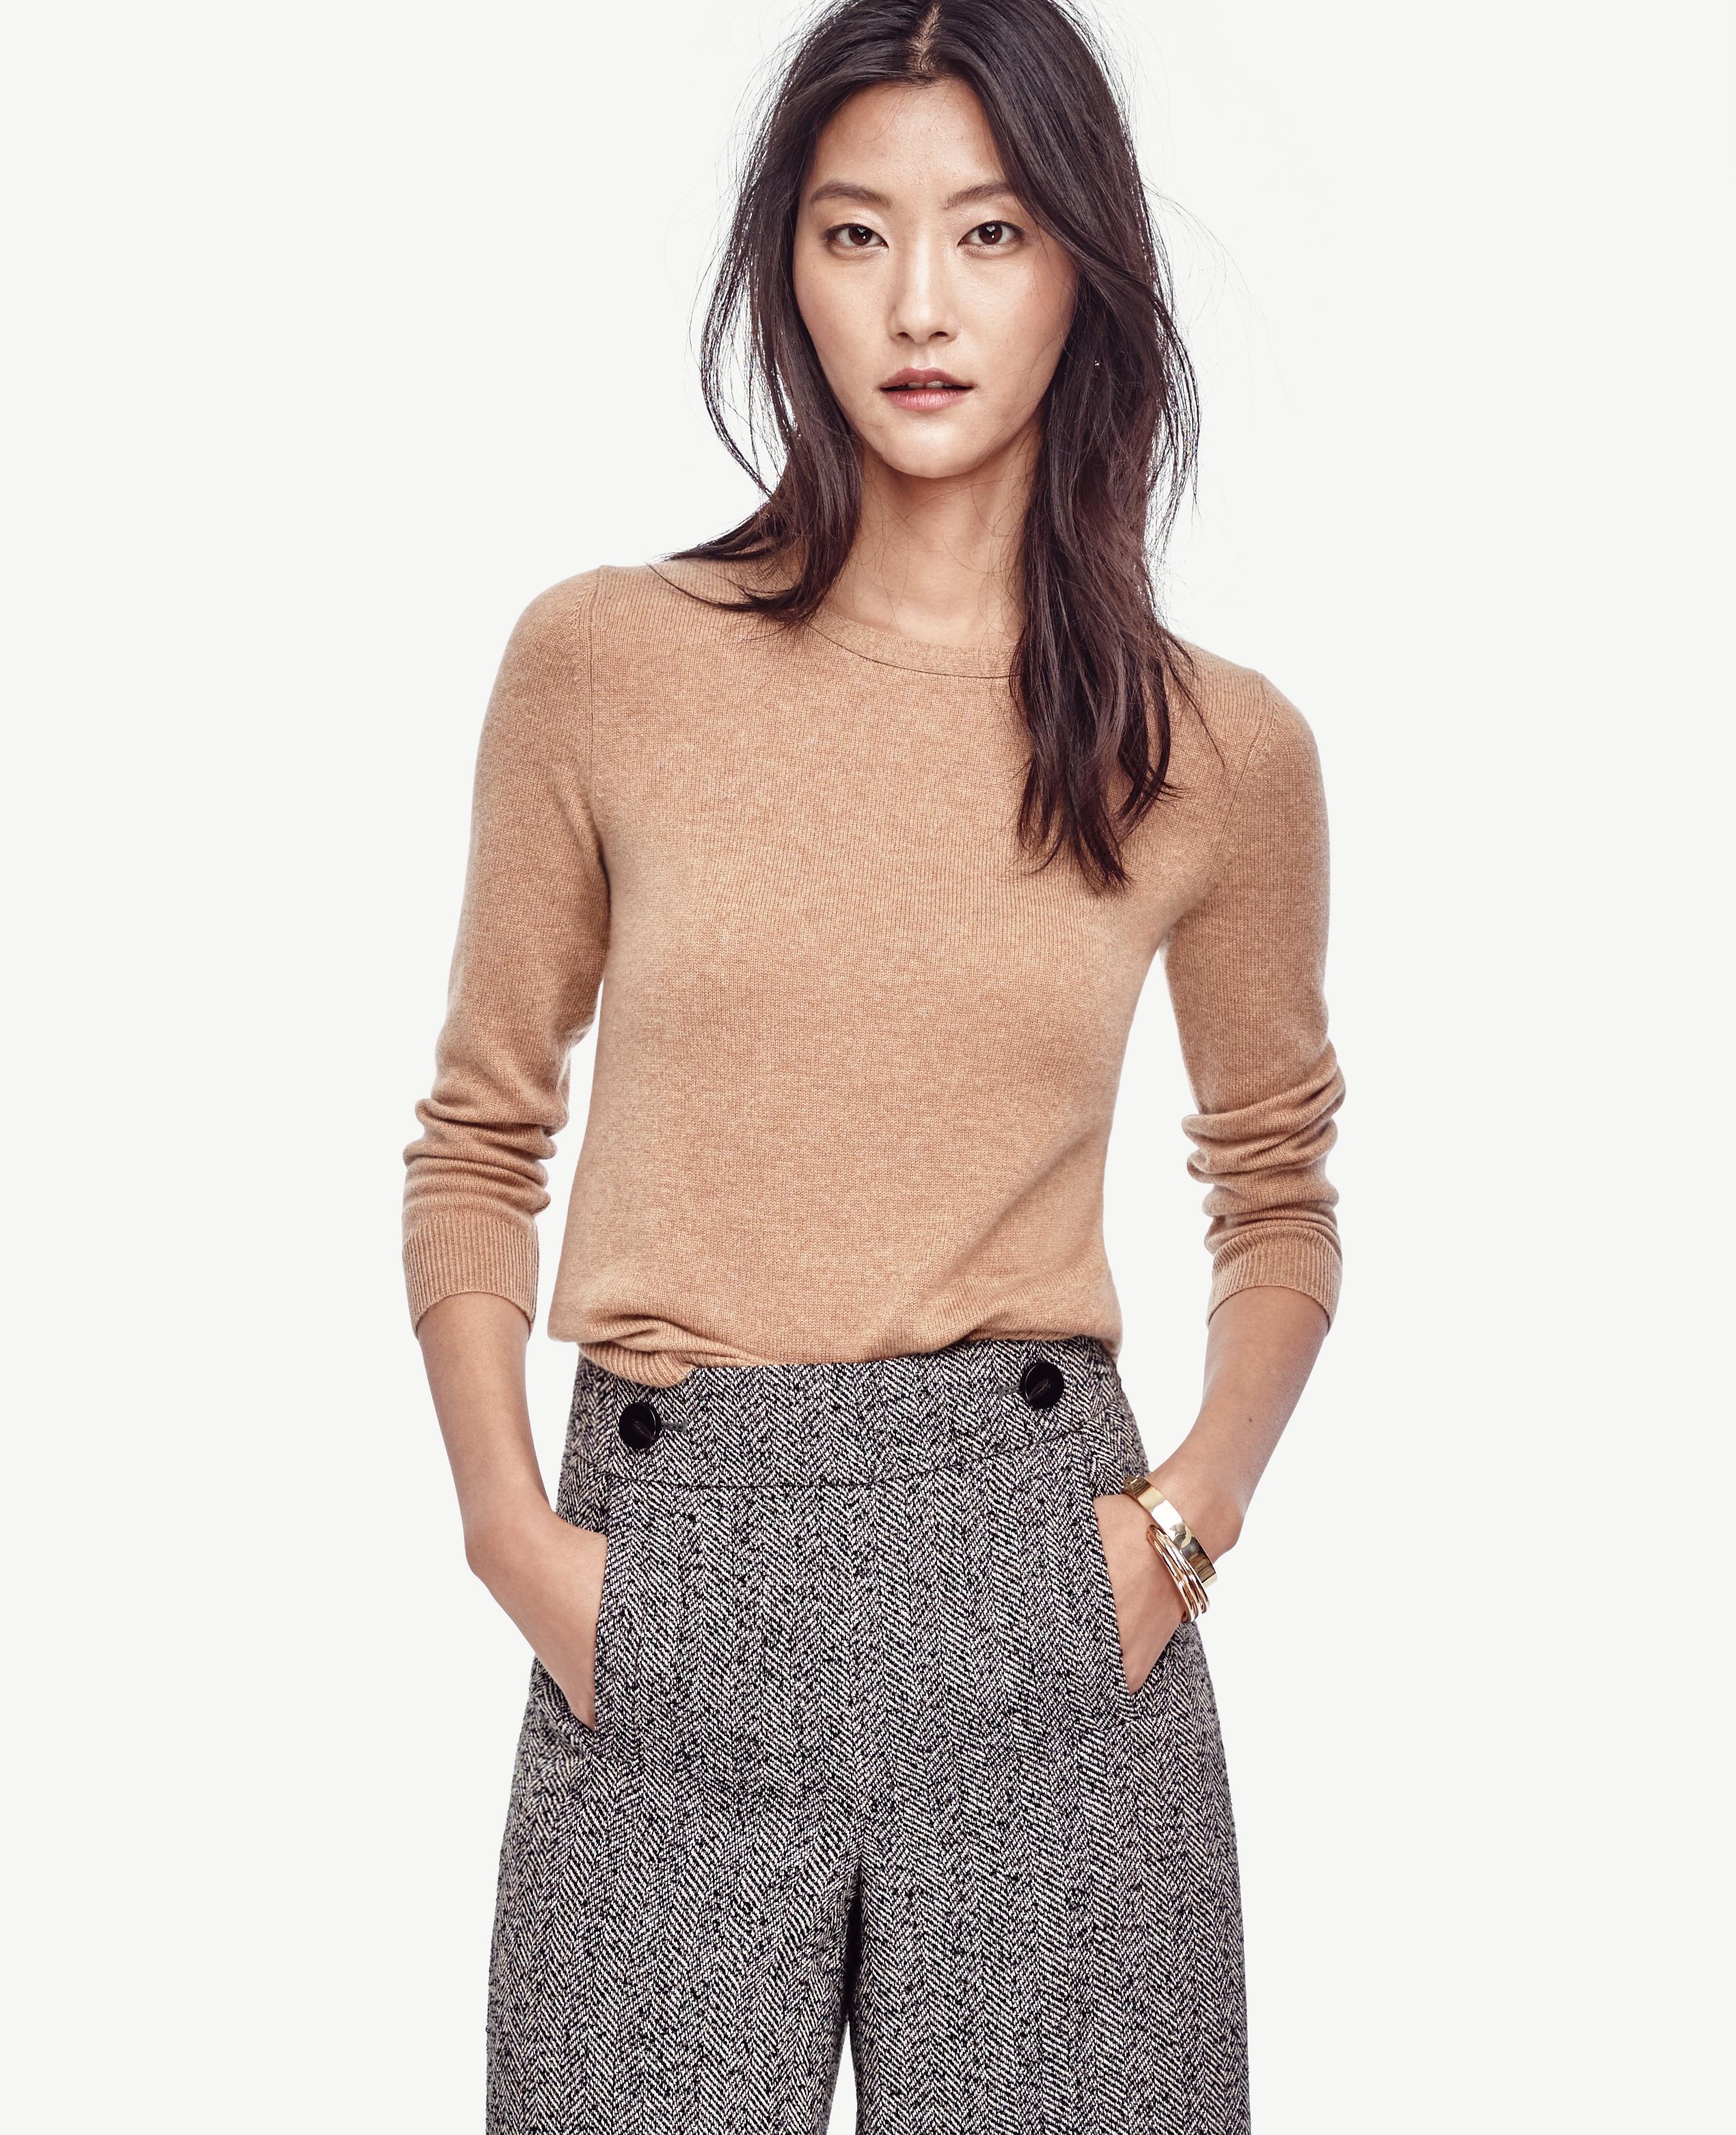 23576d8410e3 Lyst - Ann Taylor Cashmere 3 4 Sleeve Sweater